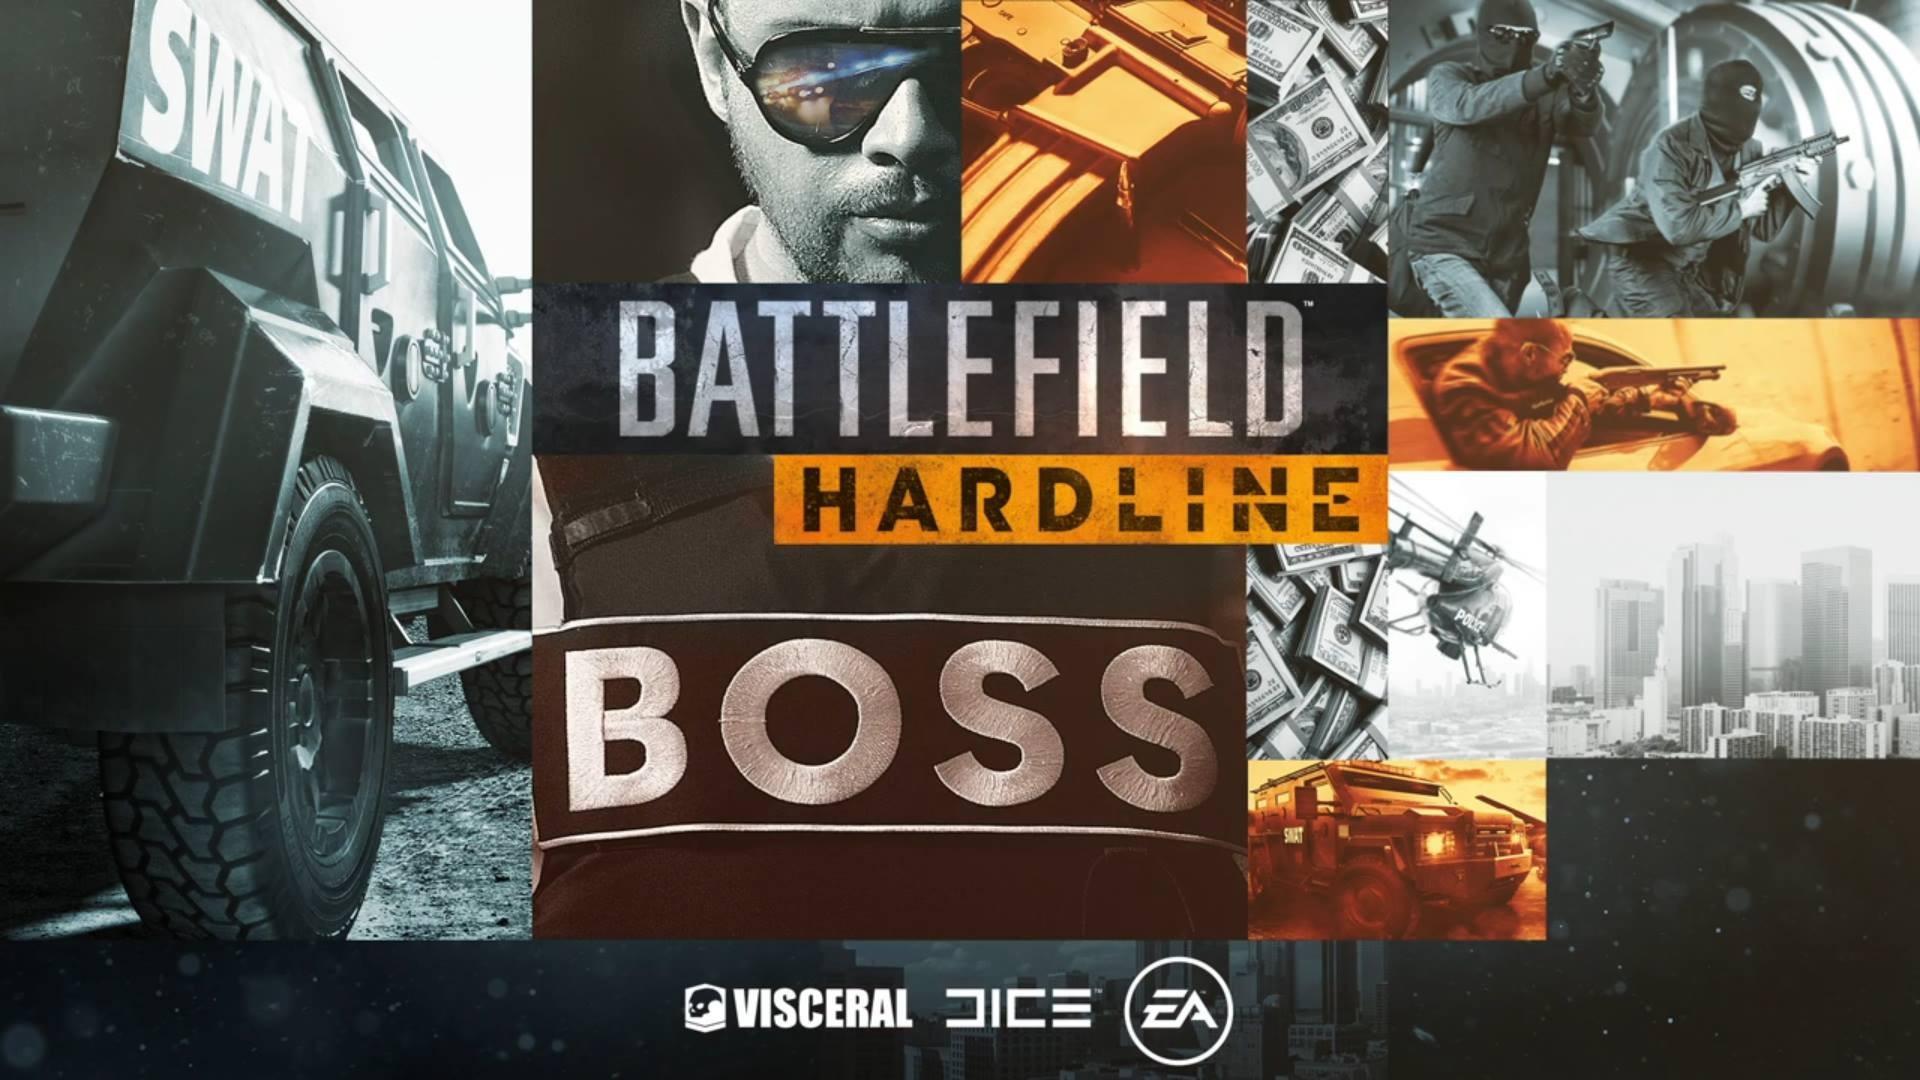 Kollegah-Battlefield-Hardline-boss[1]